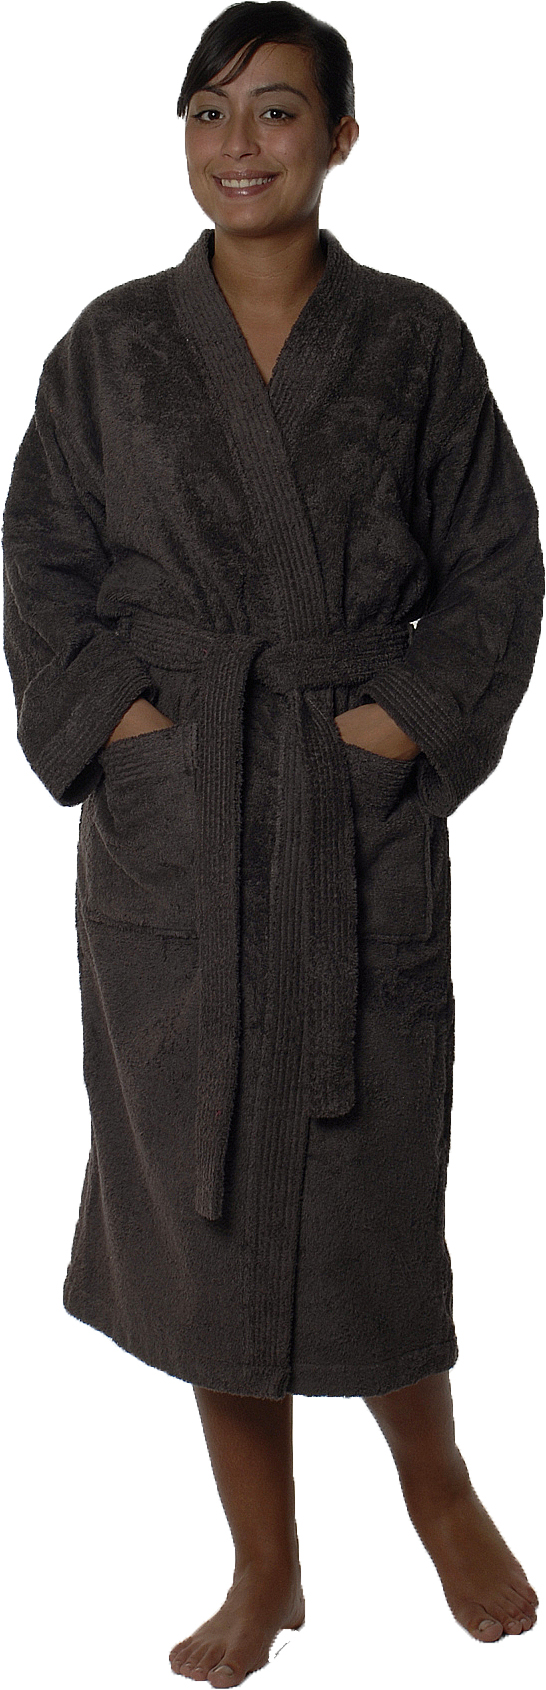 Peignoir col kimono en Coton couleur Vison Taille S